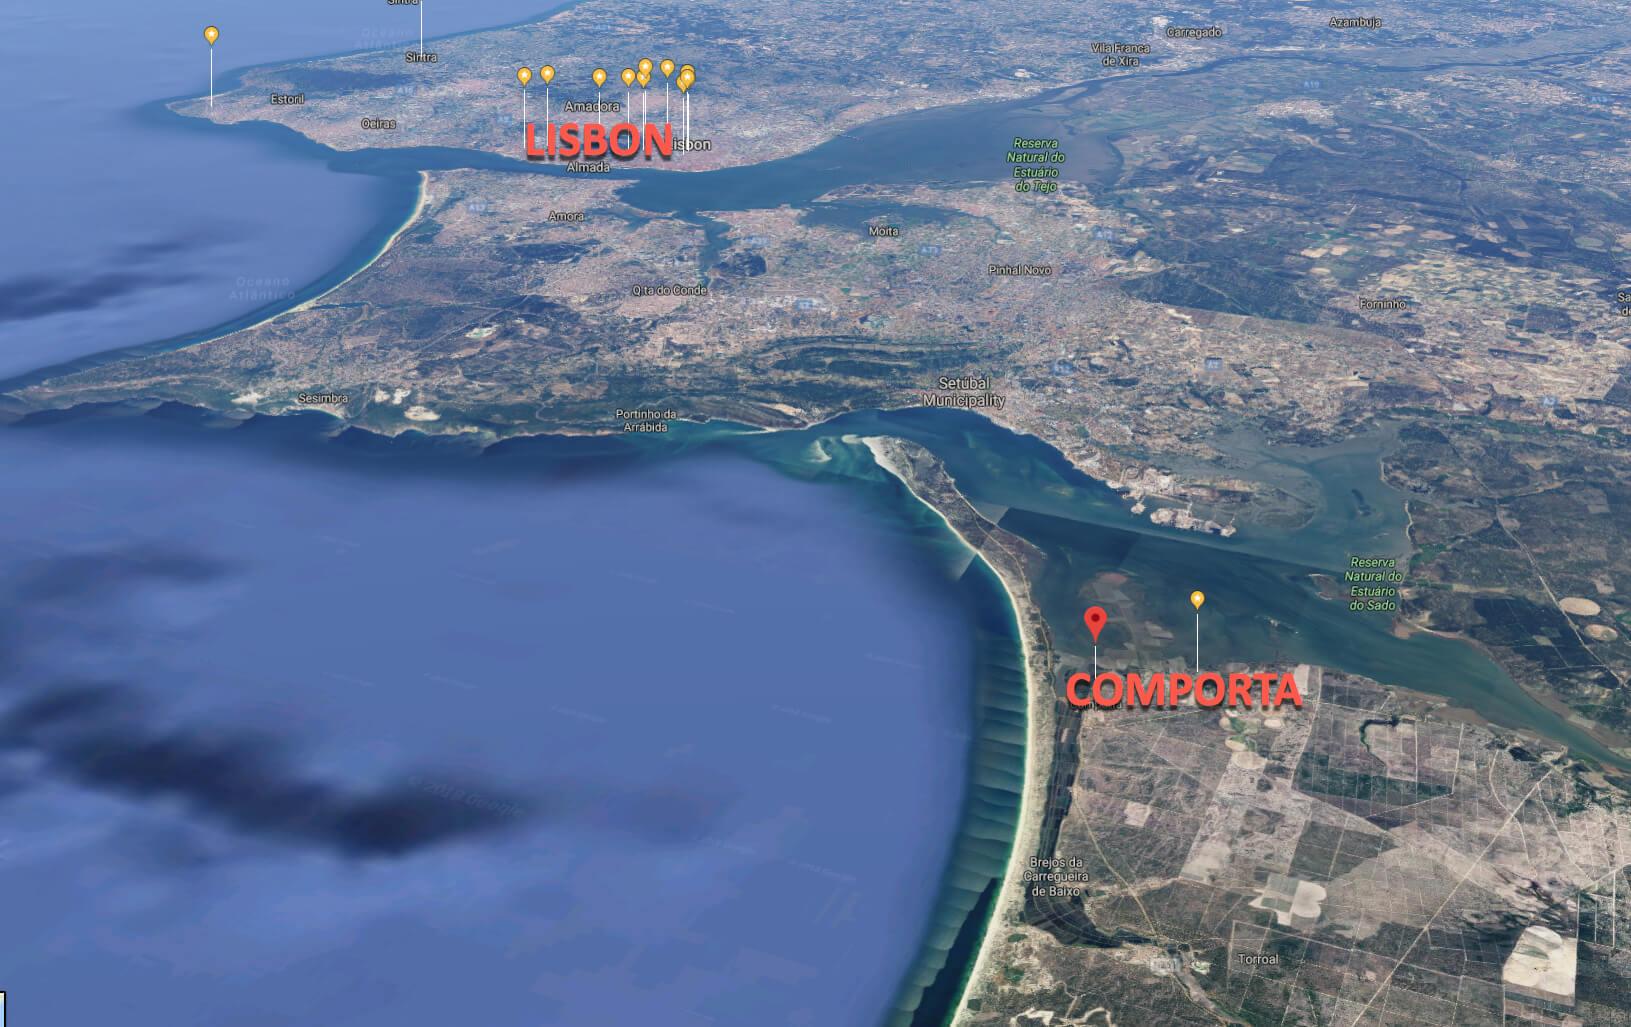 Comporta location on map